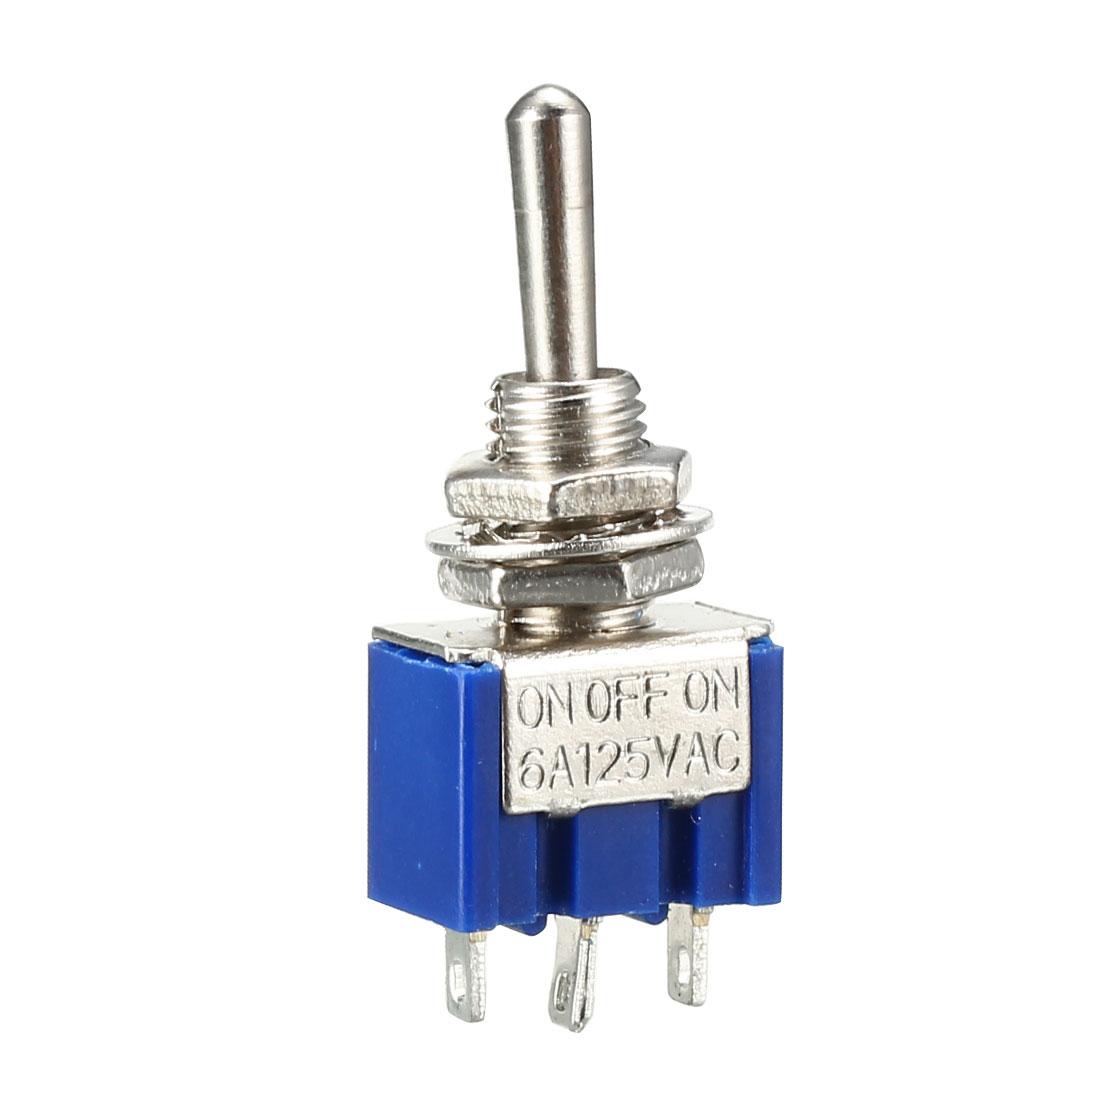 AC 125V 6A 3-Position Blue ON-Off-ON SPDT Toggle Switch